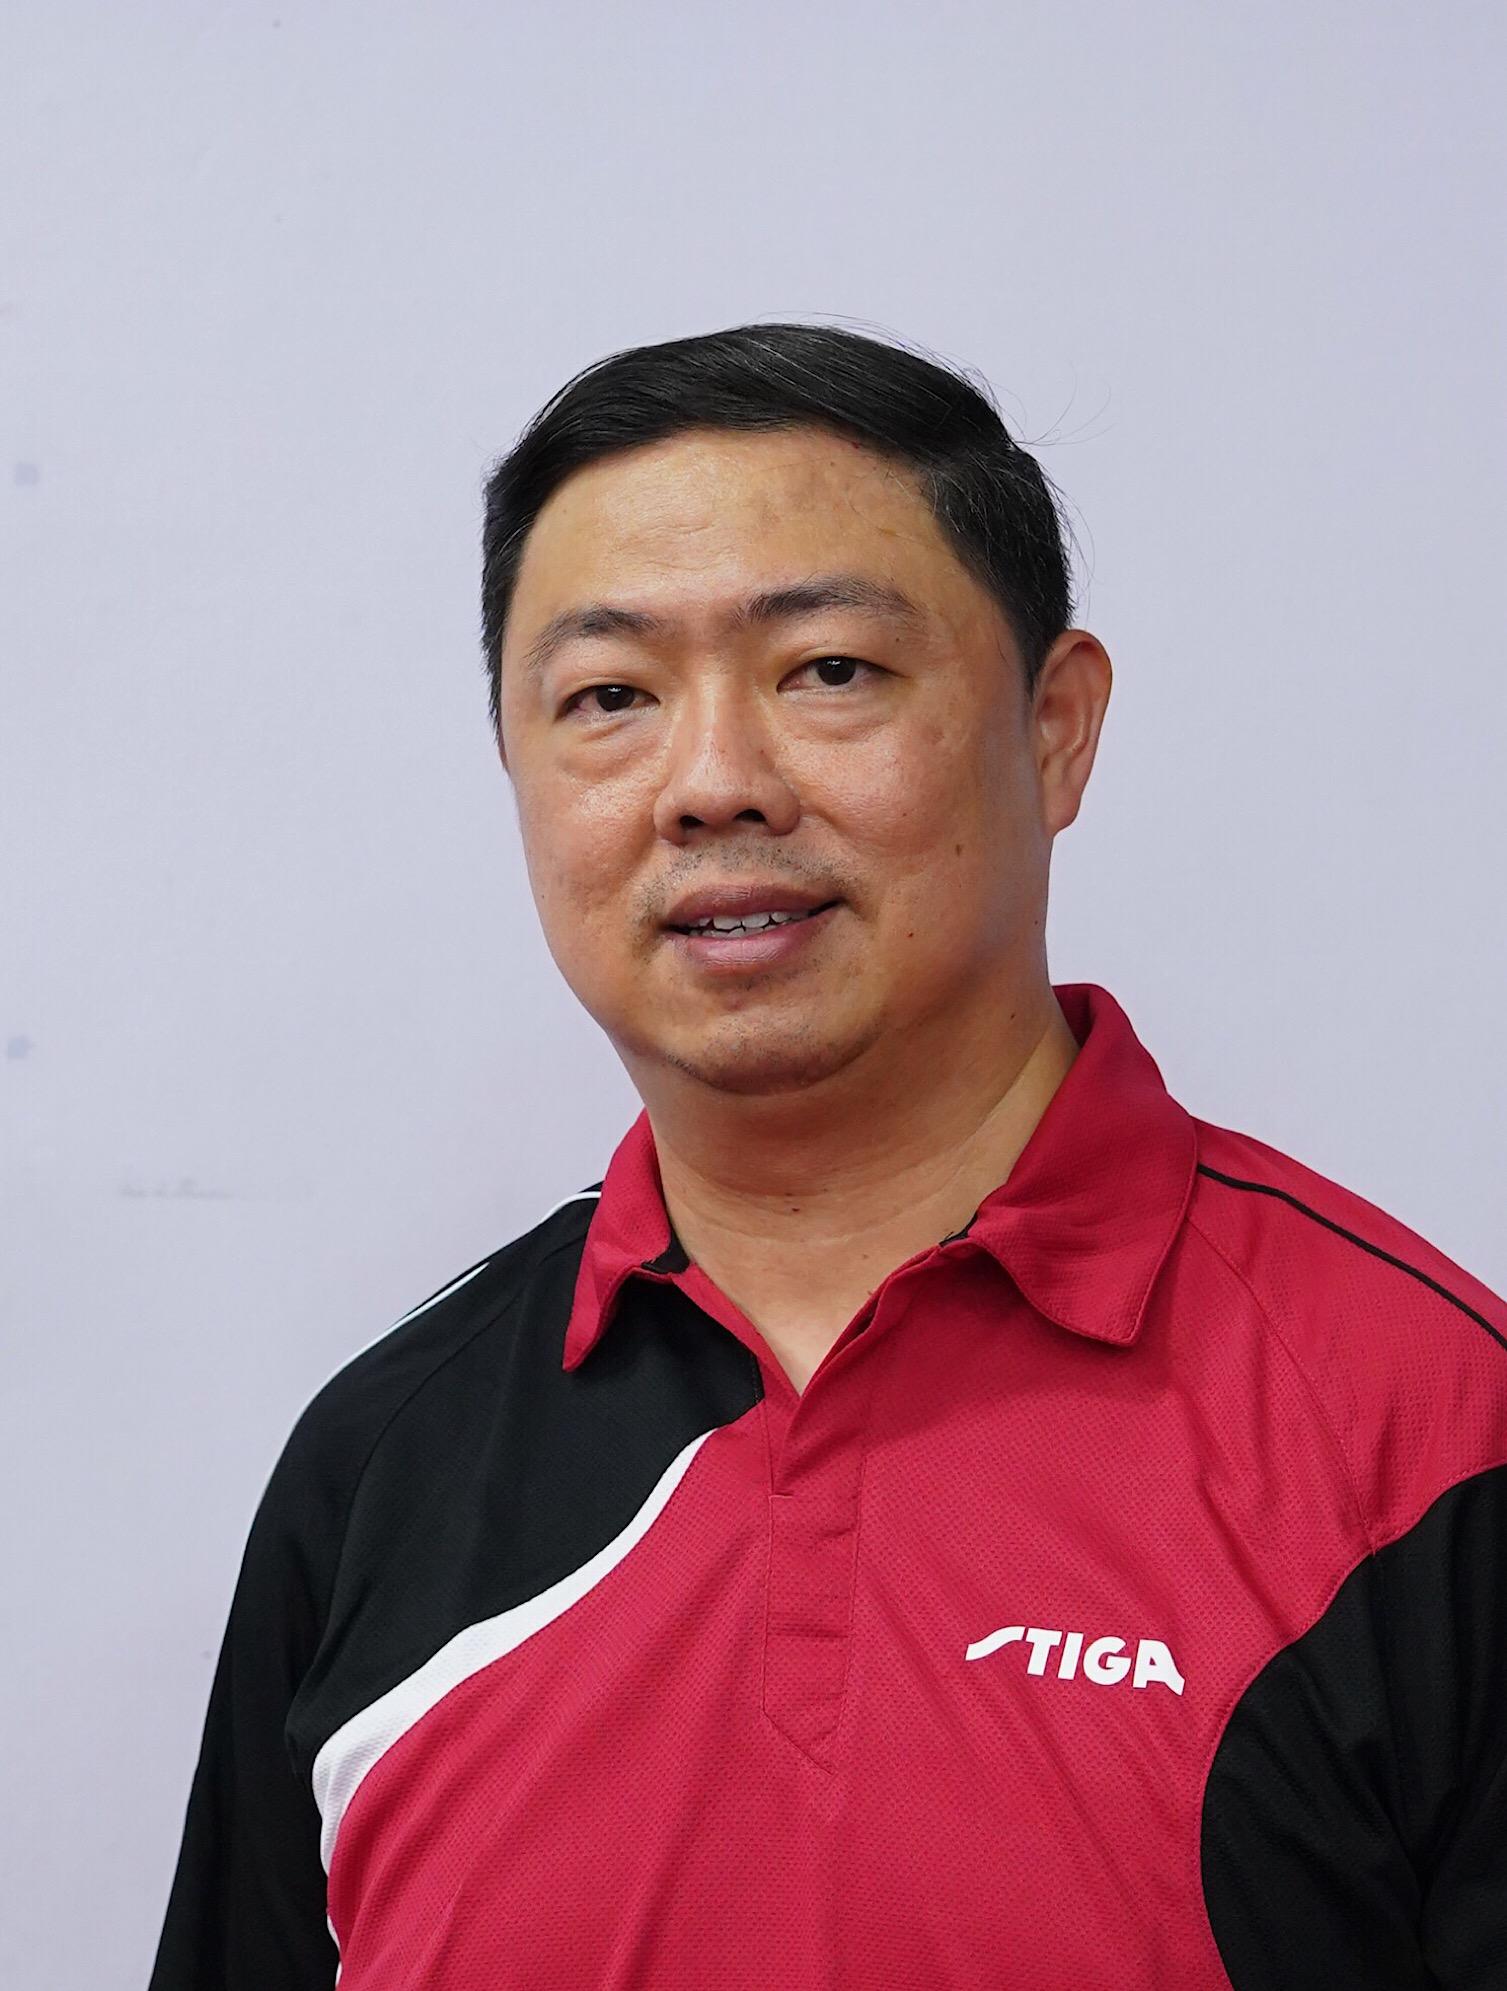 Andy Lau Chee Hoy